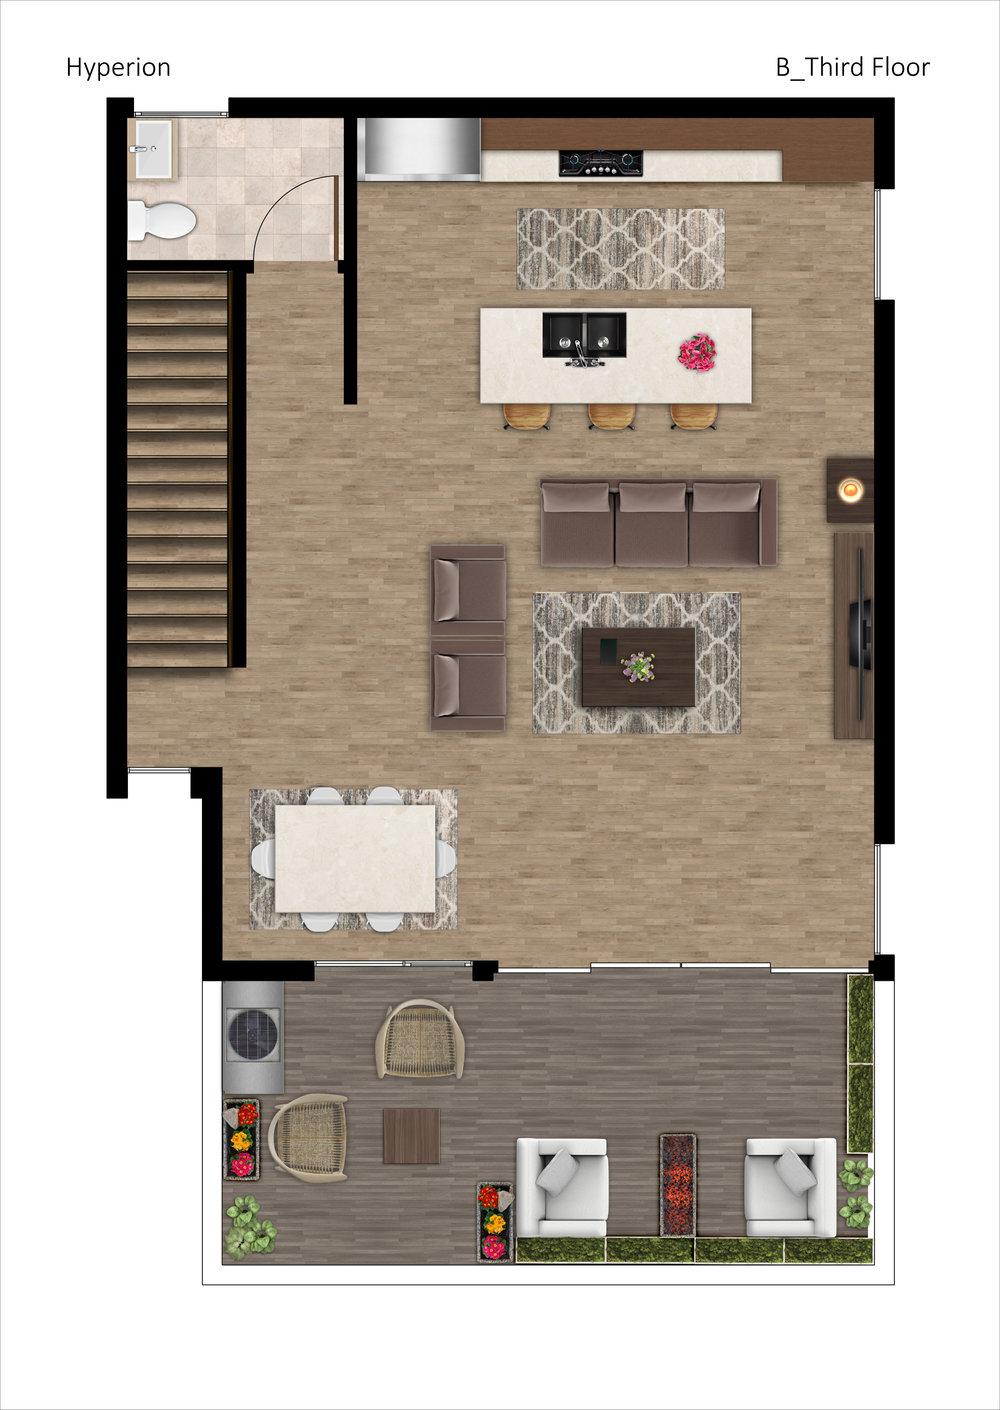 Hyperion_B_Third Floor_FNL.jpg